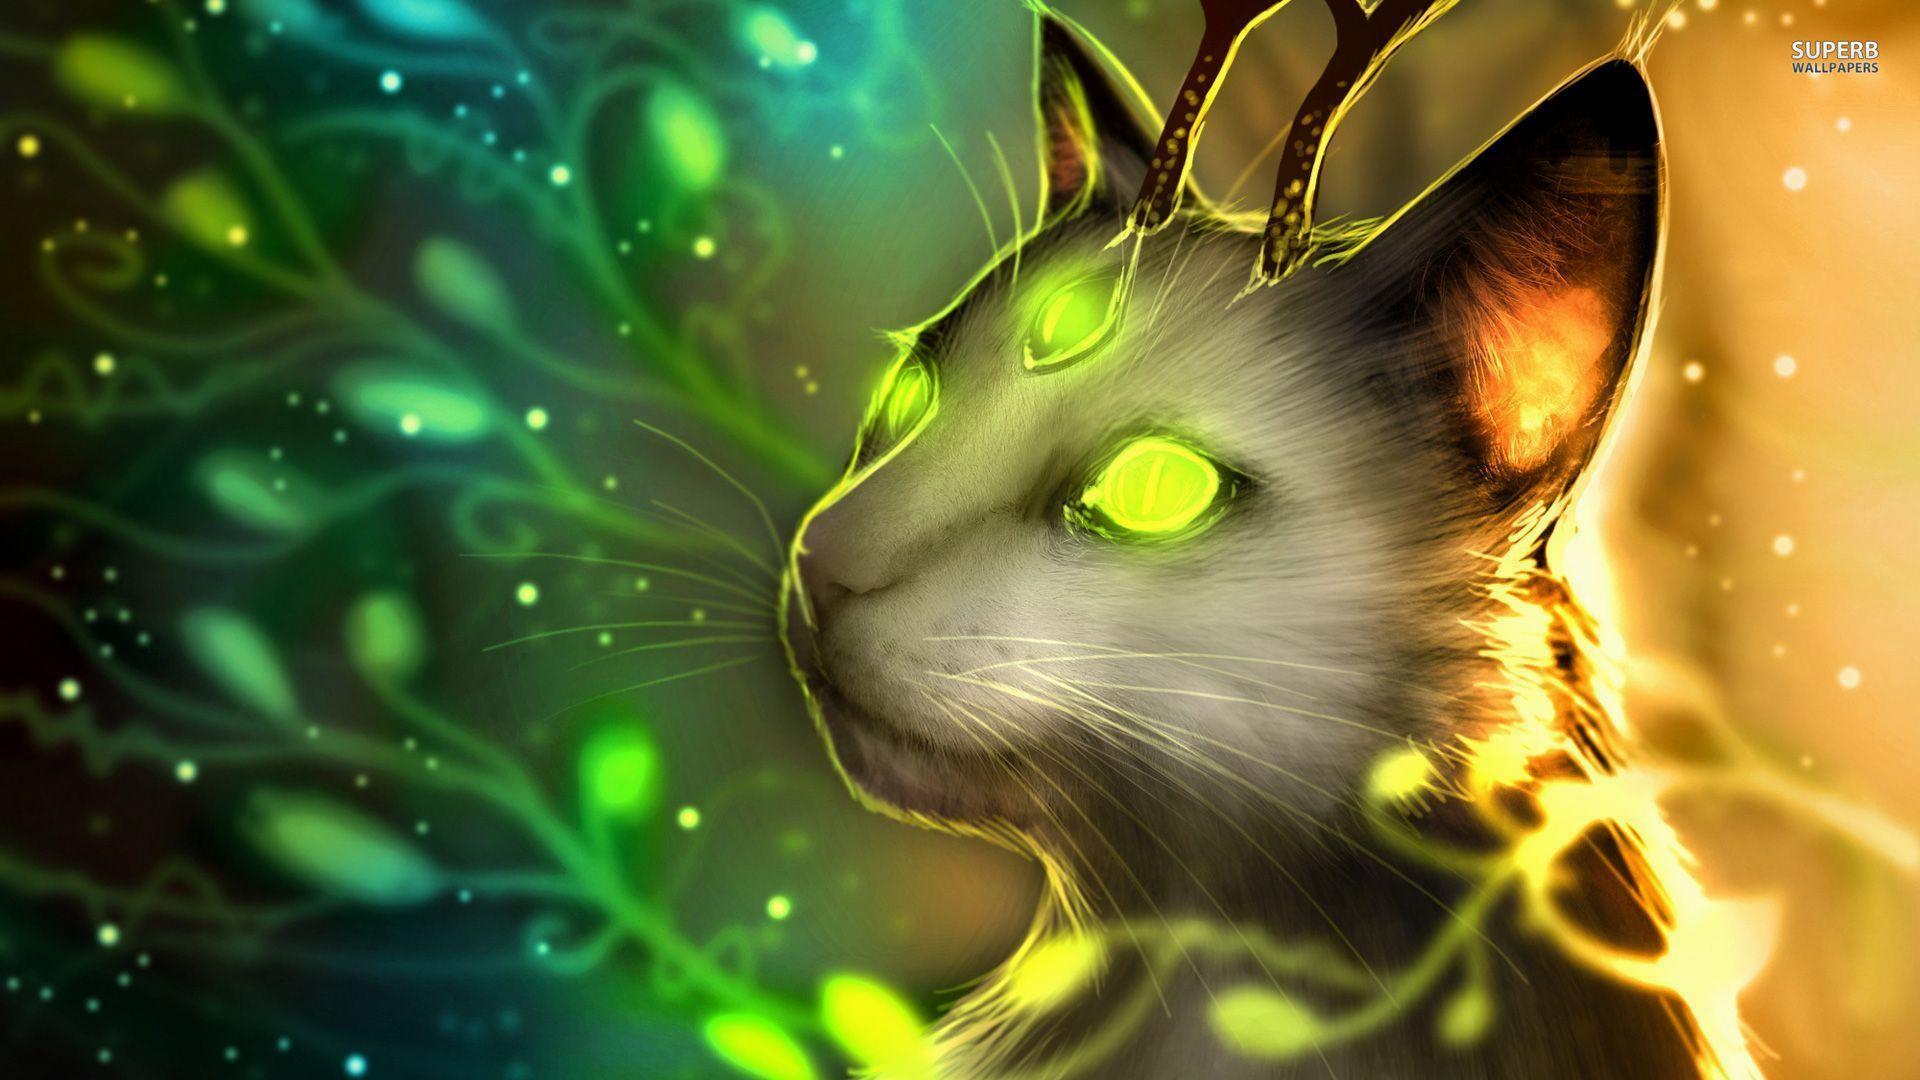 image - warrior-cats-wallpaper-2 | animal jam clans wiki